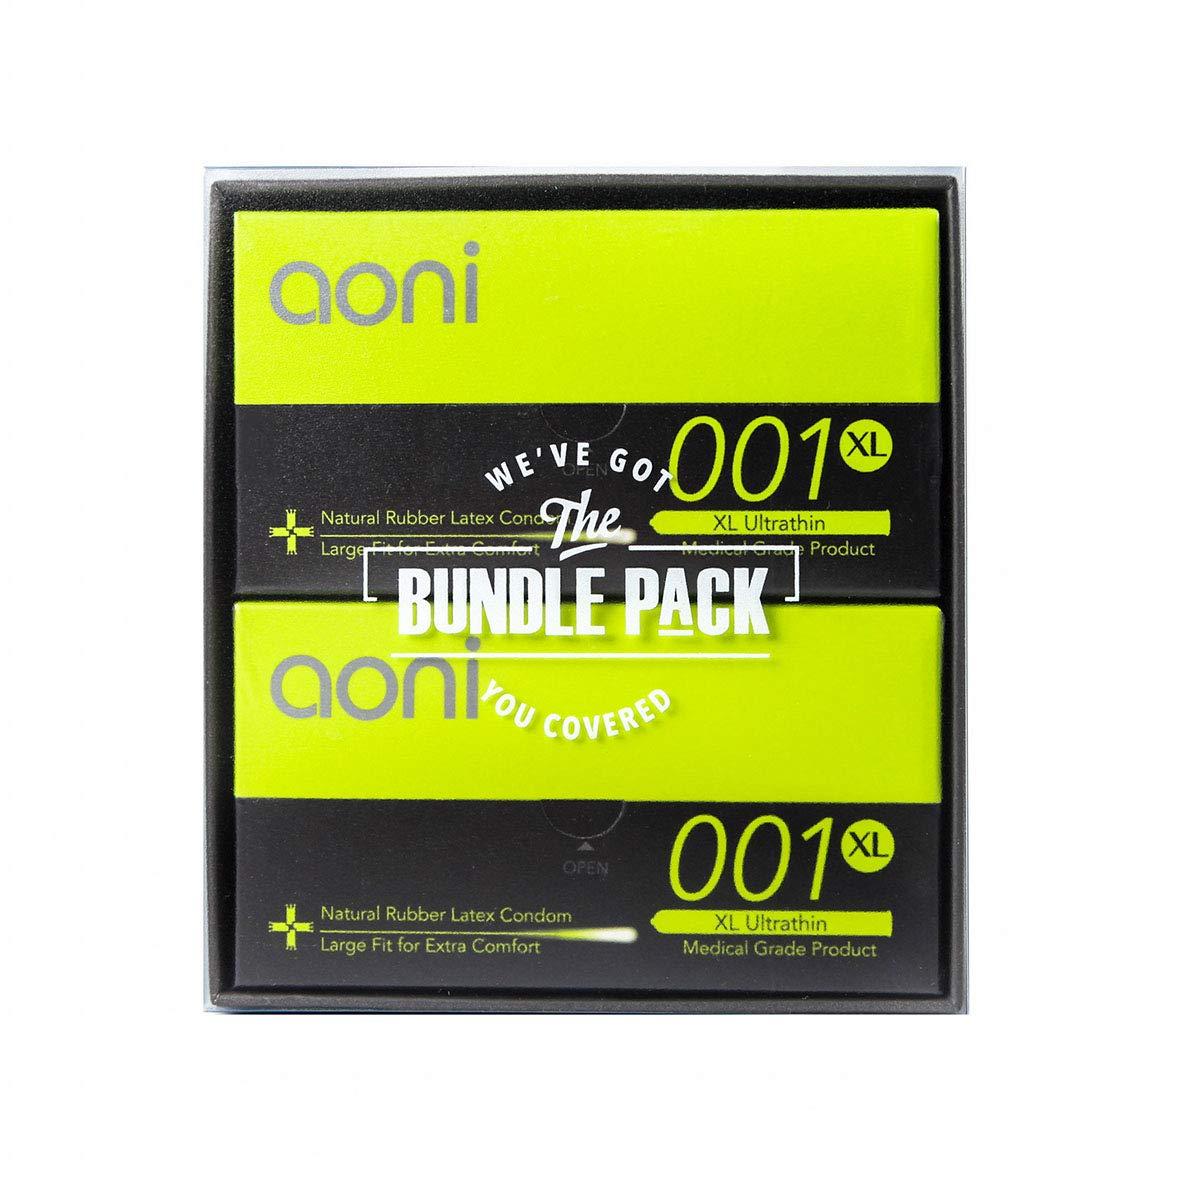 Aoni Condoms Value Pack - XL Ultrathin 001 24 PCS Bundle Pack - Premium 001 Series - Water Based Lubricant